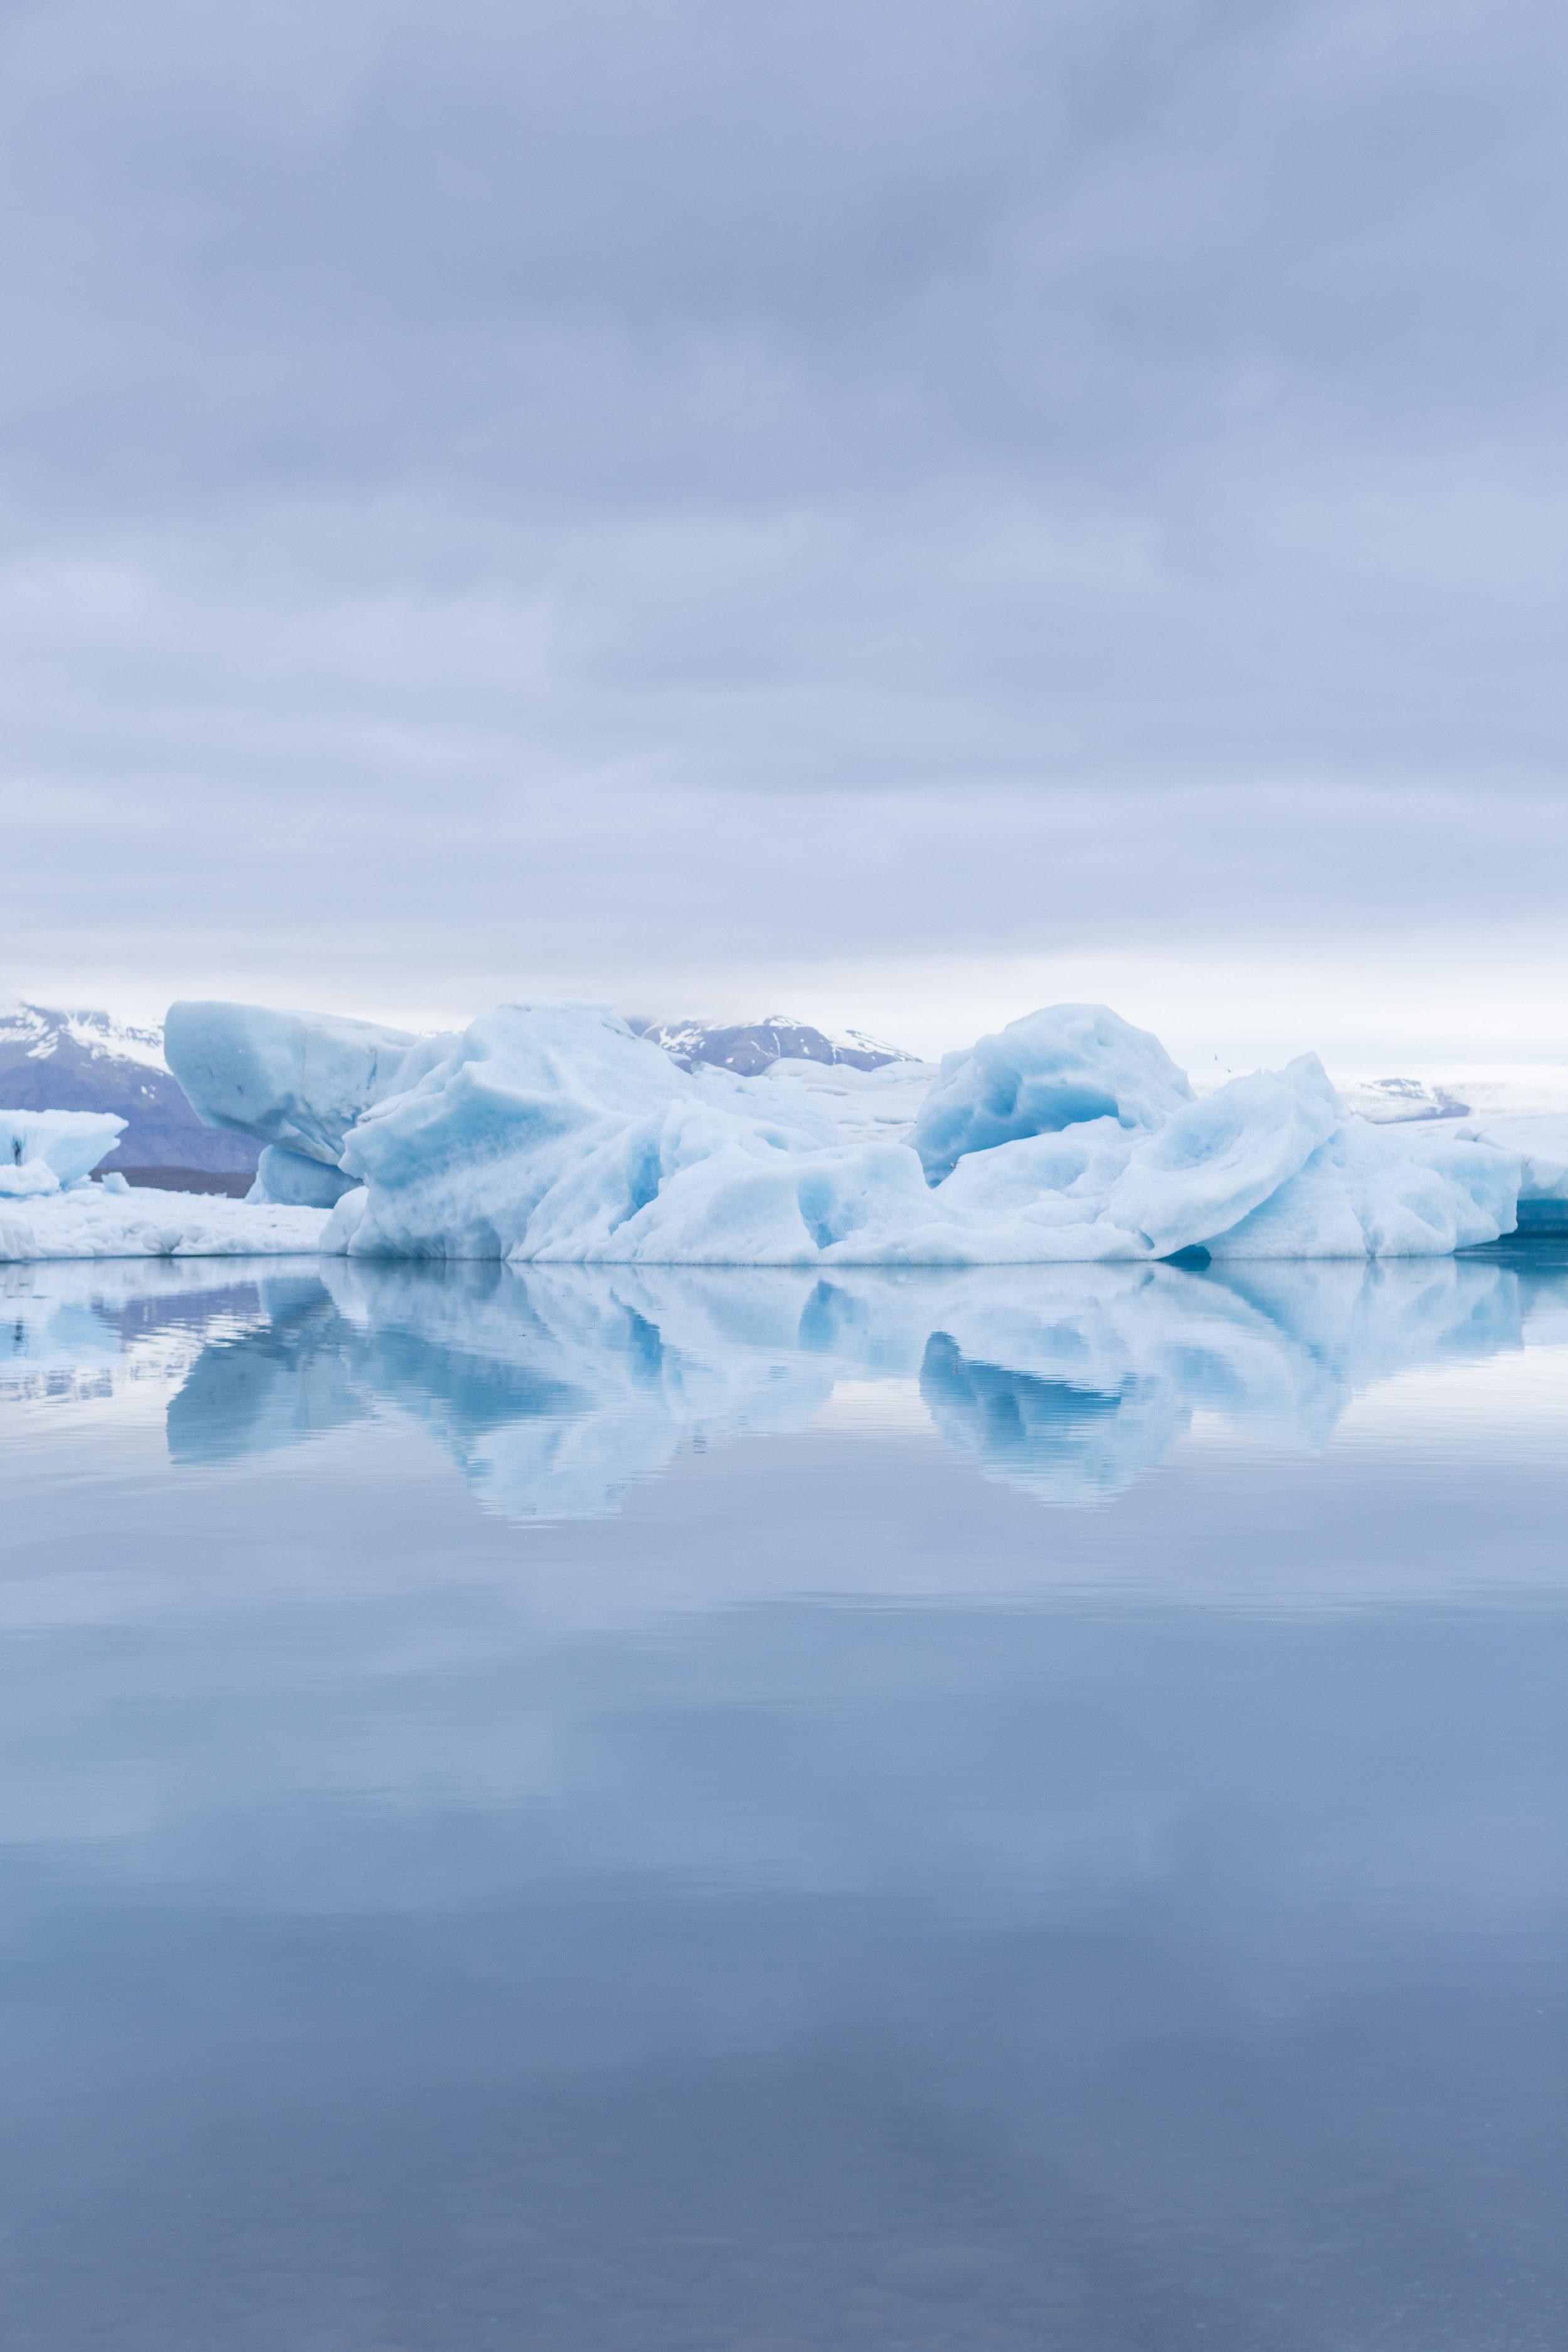 jokulsarlon-glacial-lagoon-iceland-1.jpg